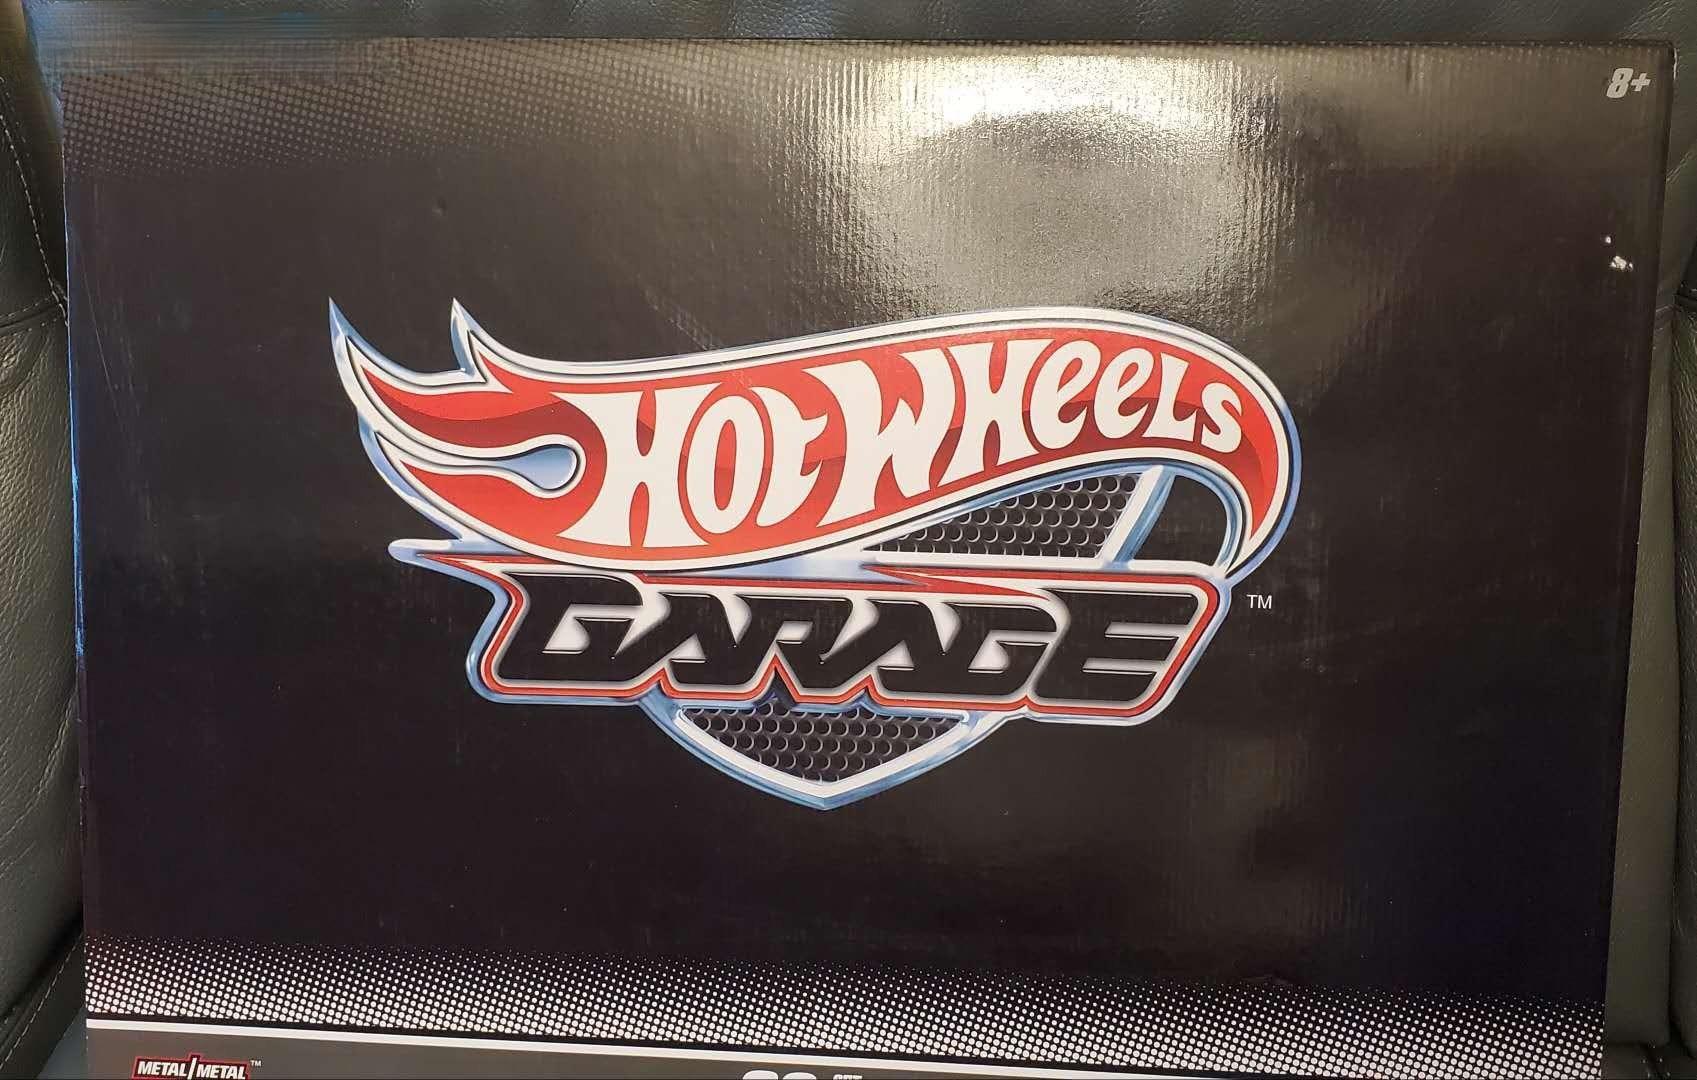 Hotwheels 1:64 المرآب فيراري 30 مجموعة مجموعة طبعة معدنية ديكاست نموذج سباق السيارات لعب الاطفال